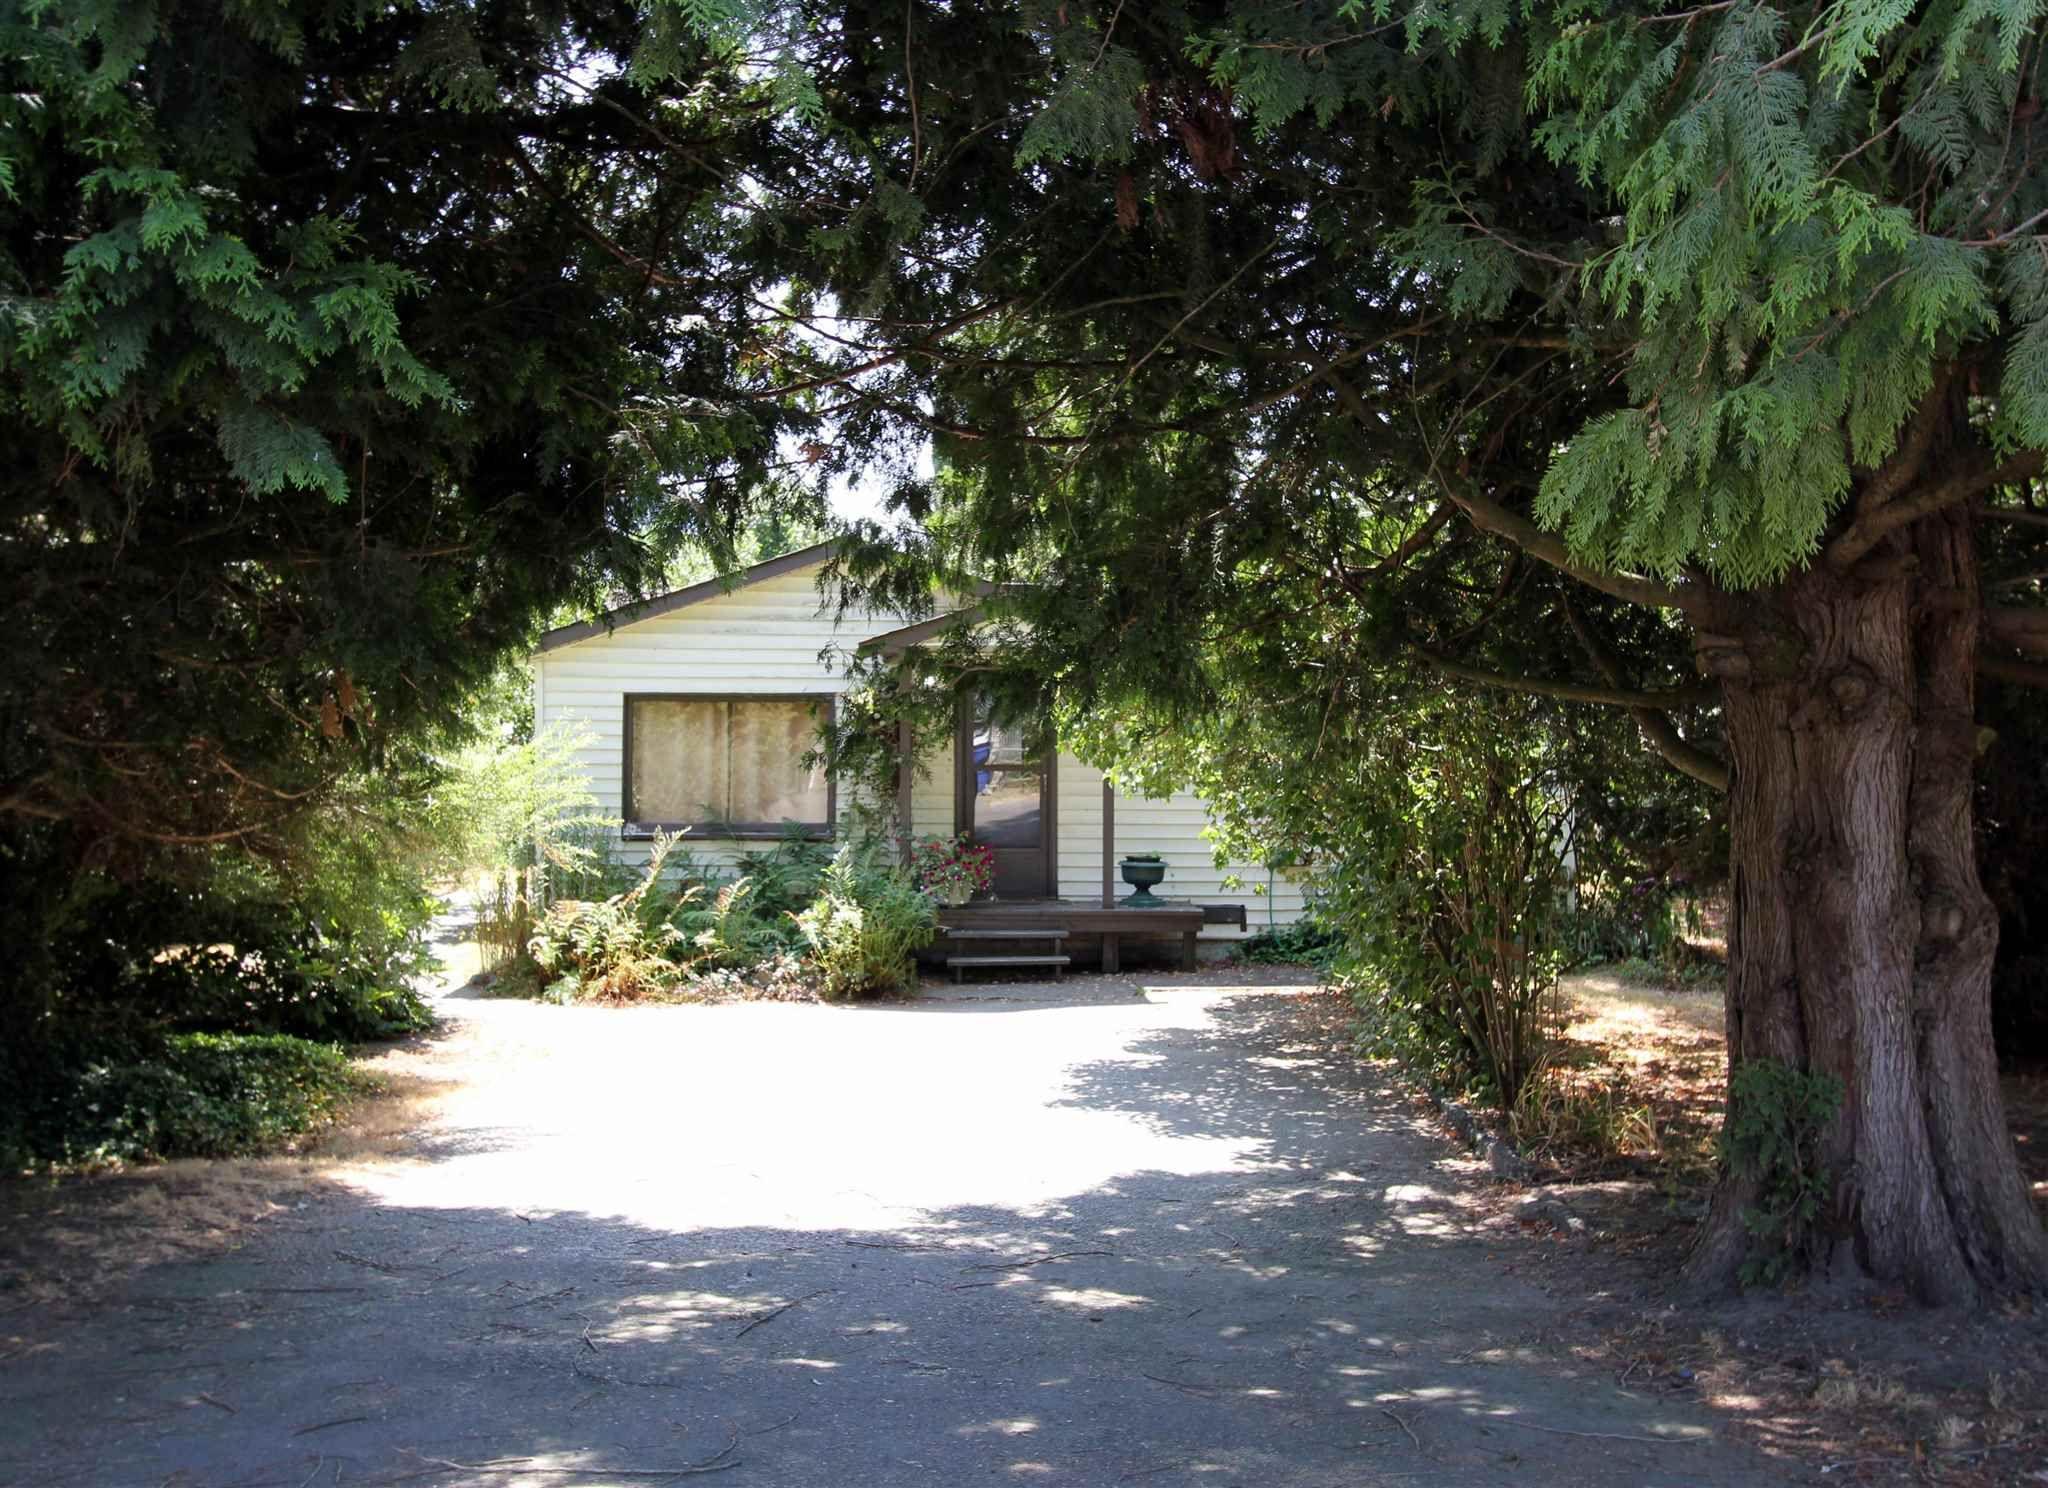 Main Photo: 41350 YARROW CENTRAL Road: Yarrow House for sale : MLS®# R2604550